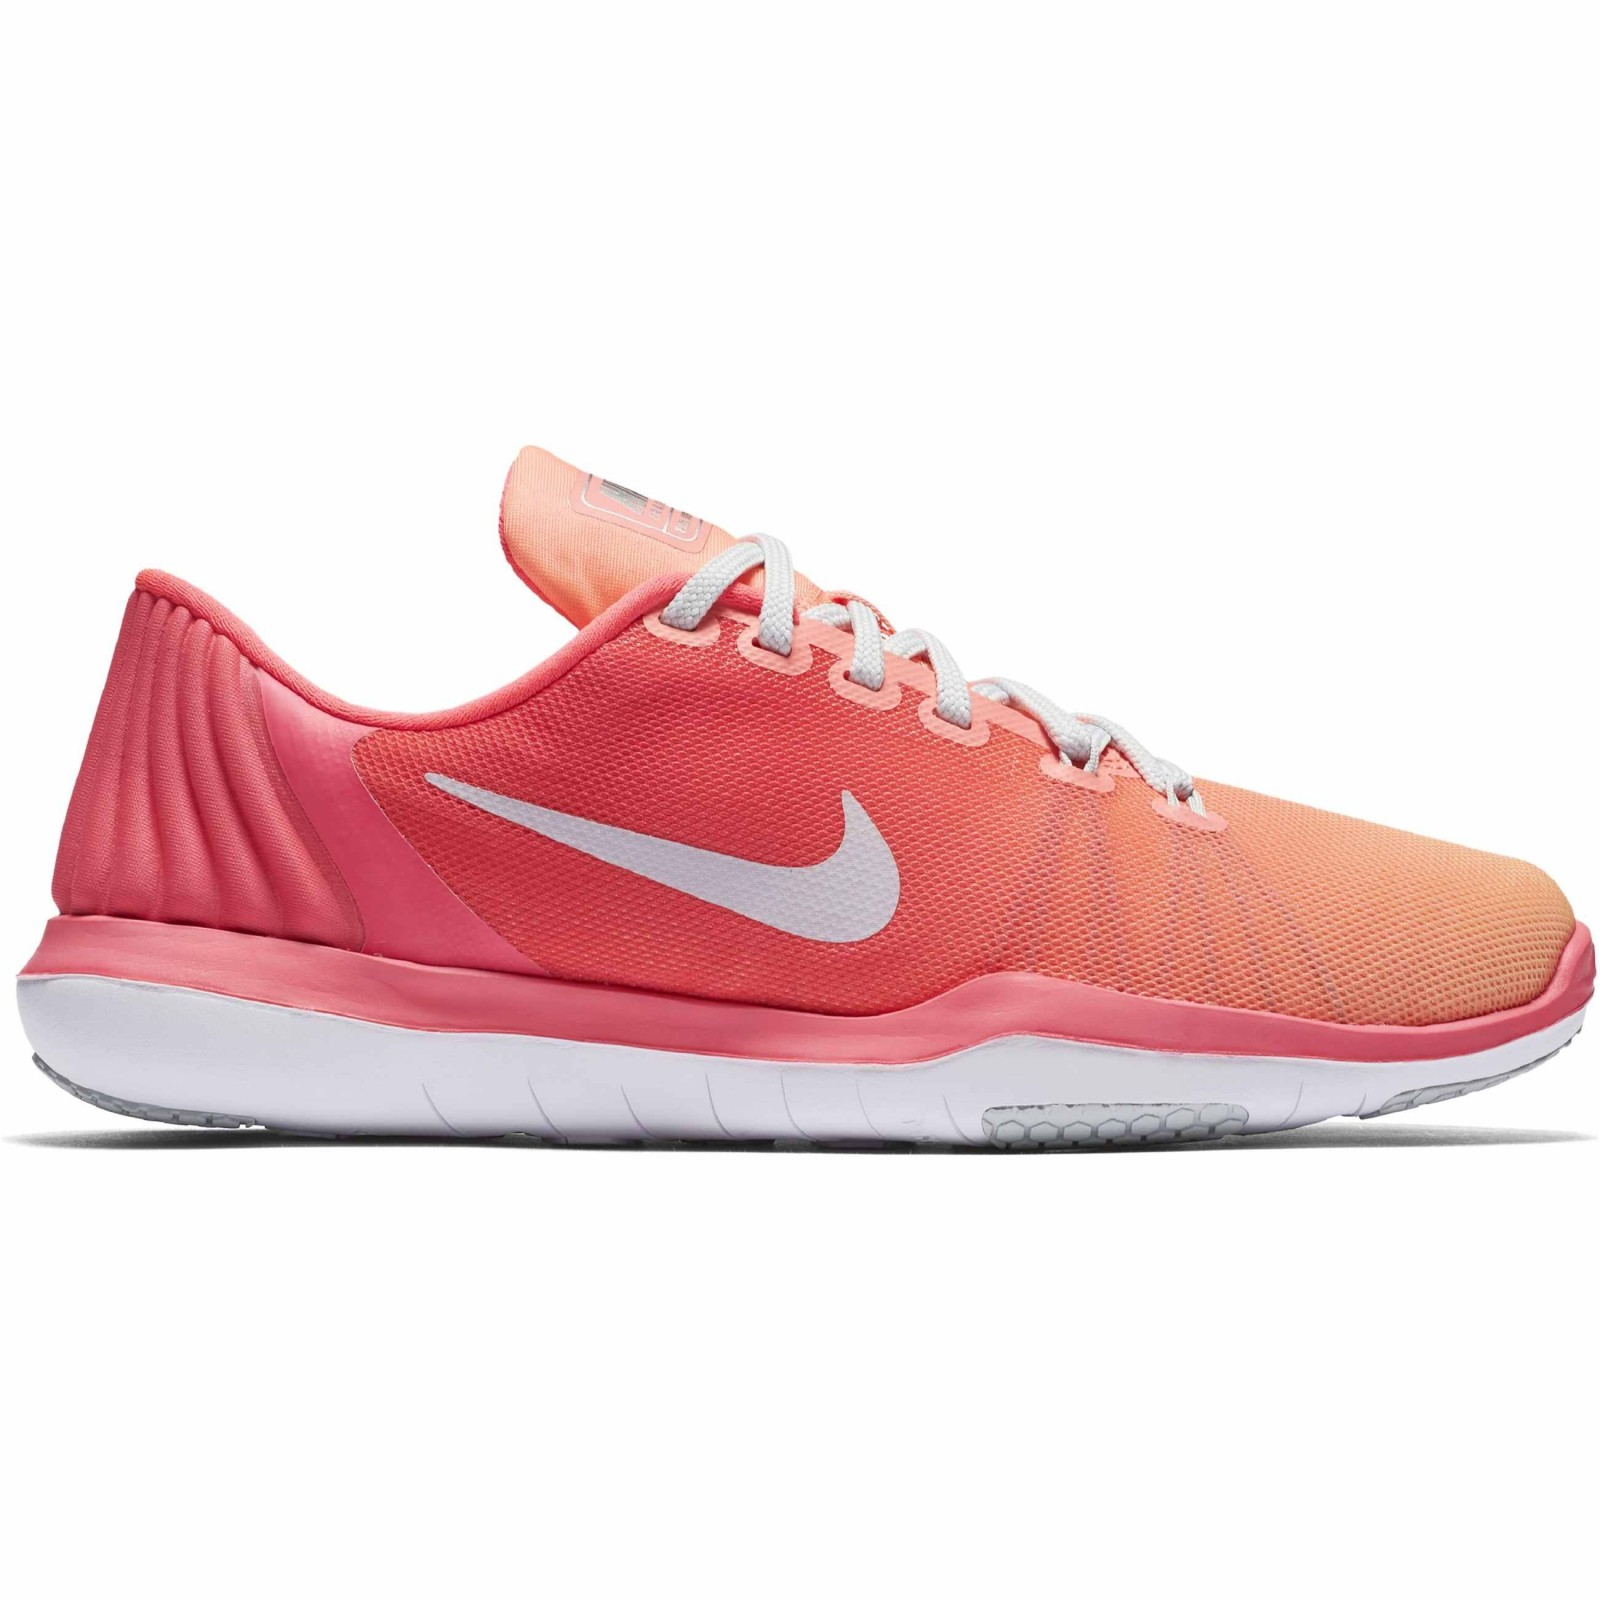 Dámské fitness boty Nike W FLEX SUPREME TR 5 FADE  1ca124a074